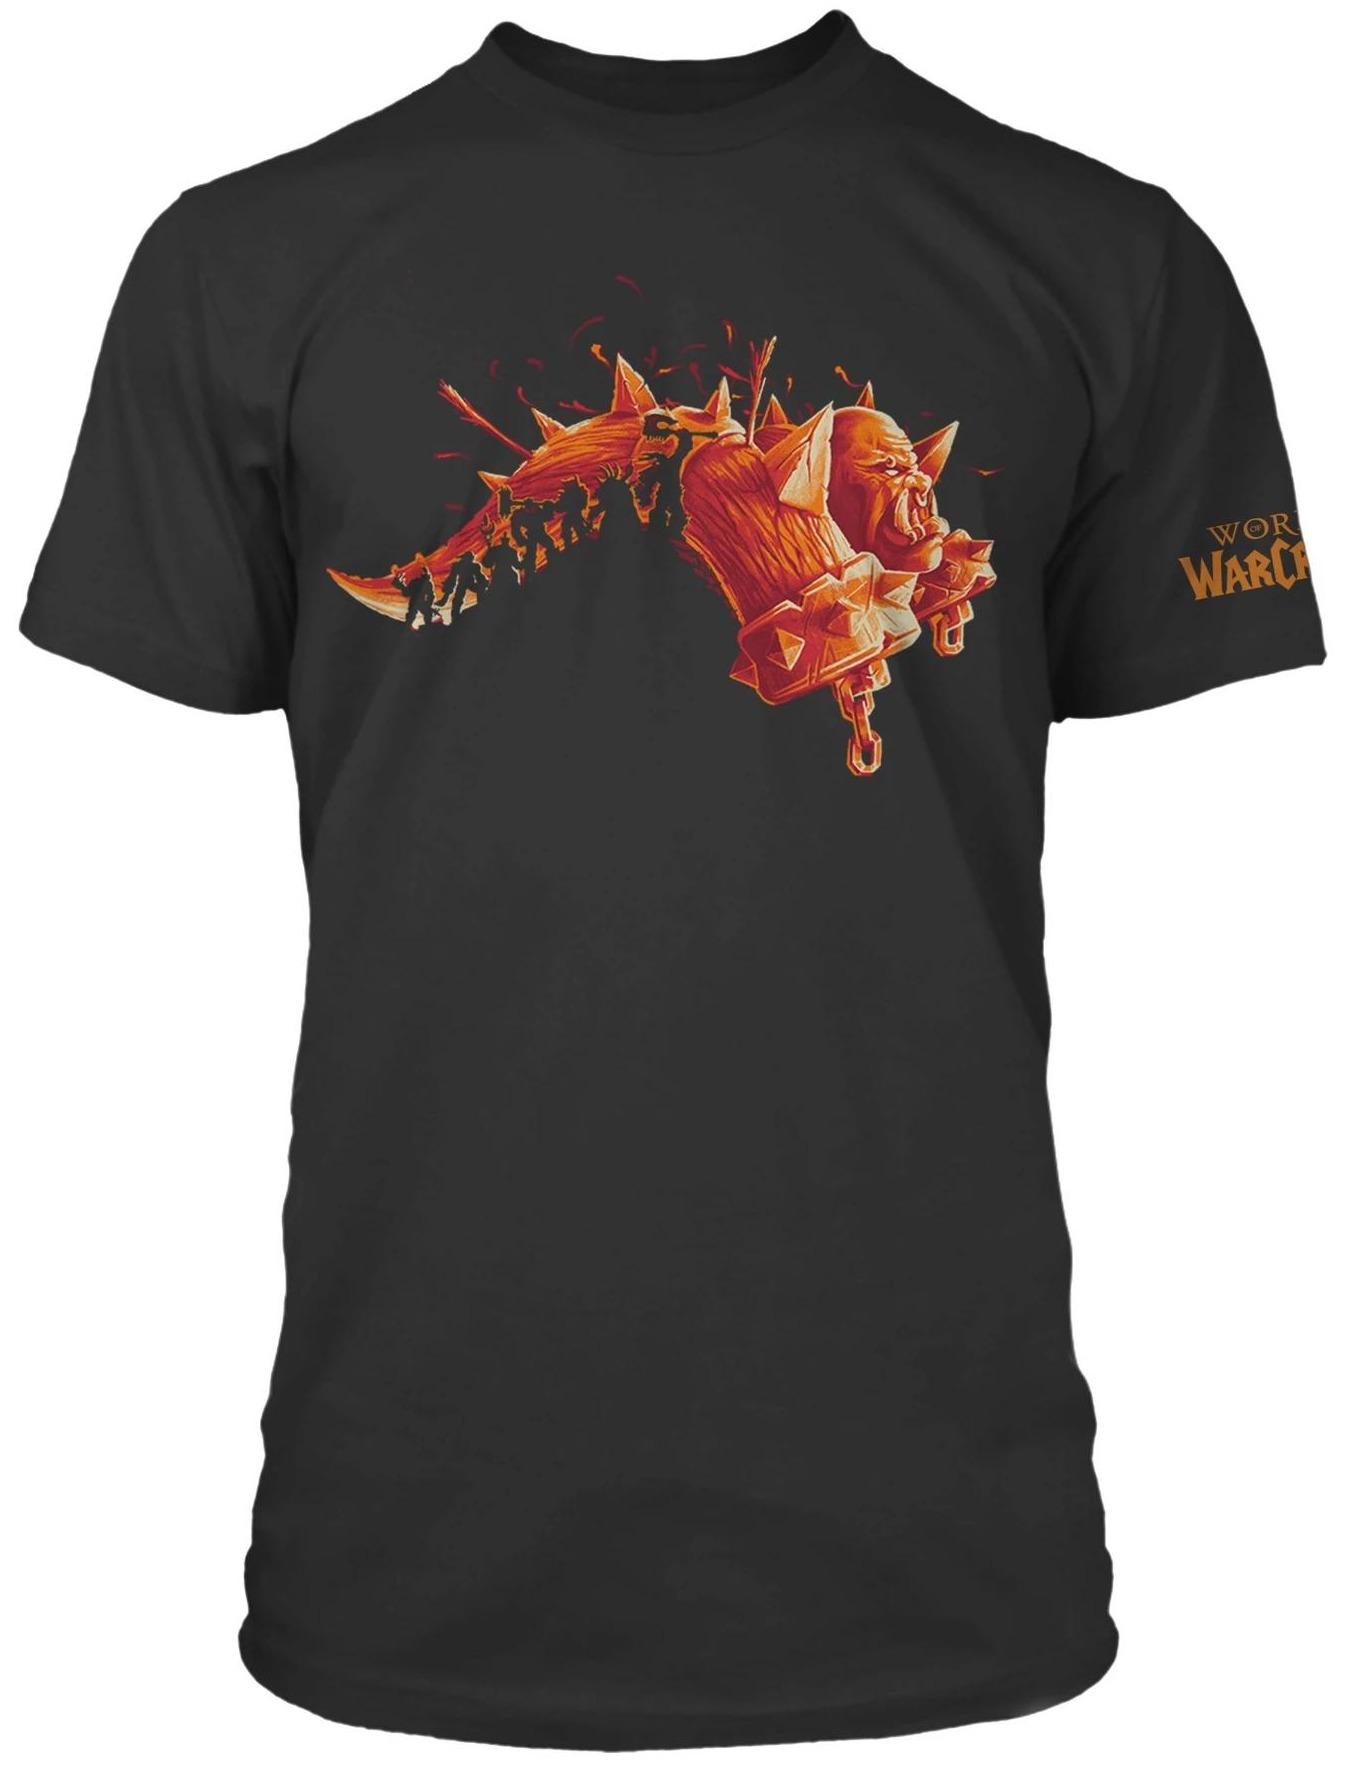 Tričko World of Warcraft - Expansion Series Warlords of Draenor (americká vel. S / evropská M)